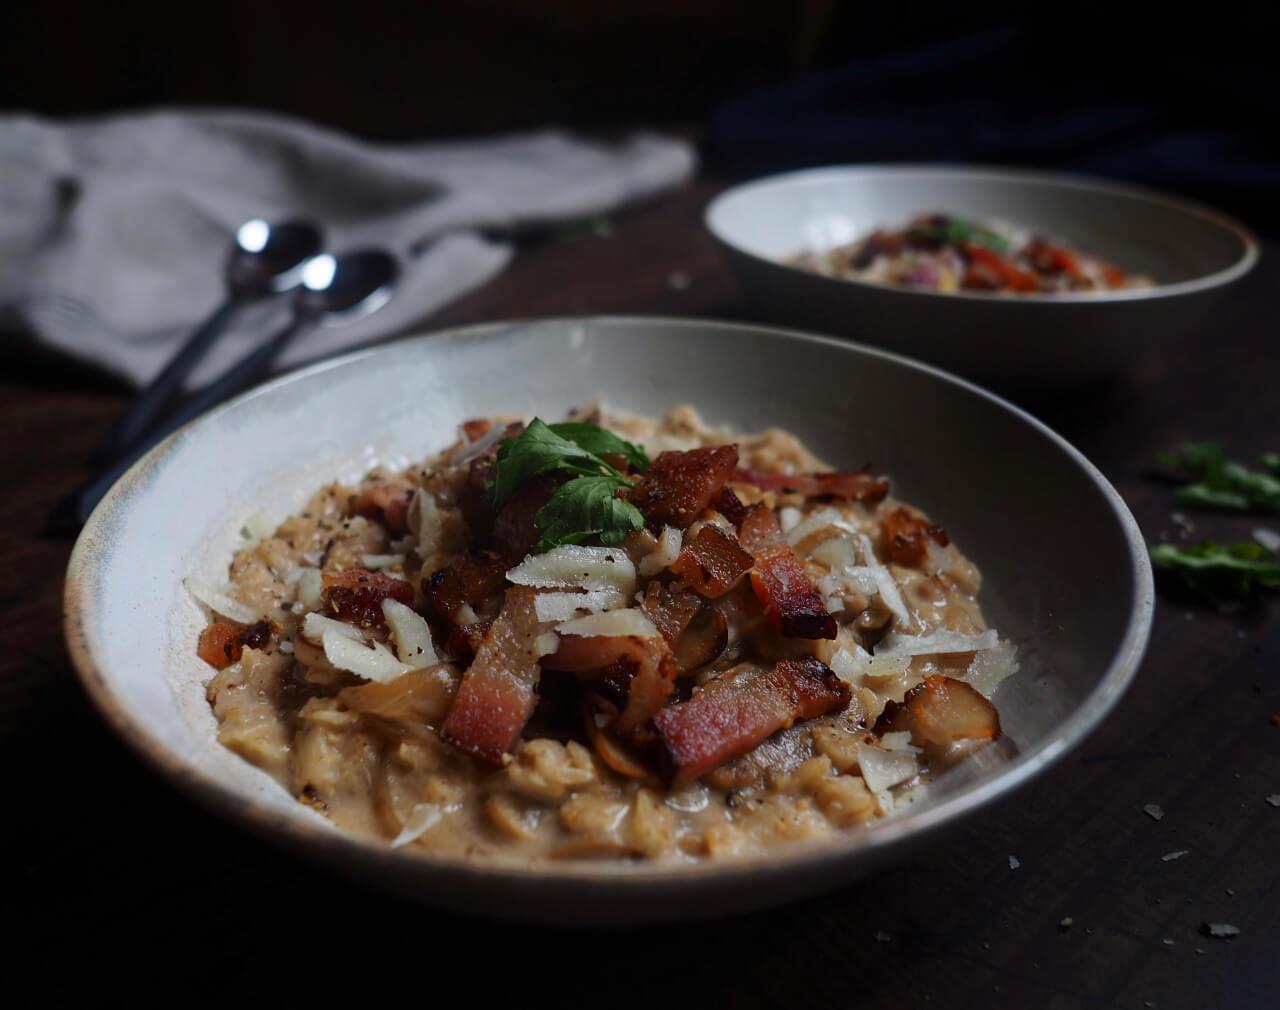 Bacon and Mushroom Oatmeal Risotto